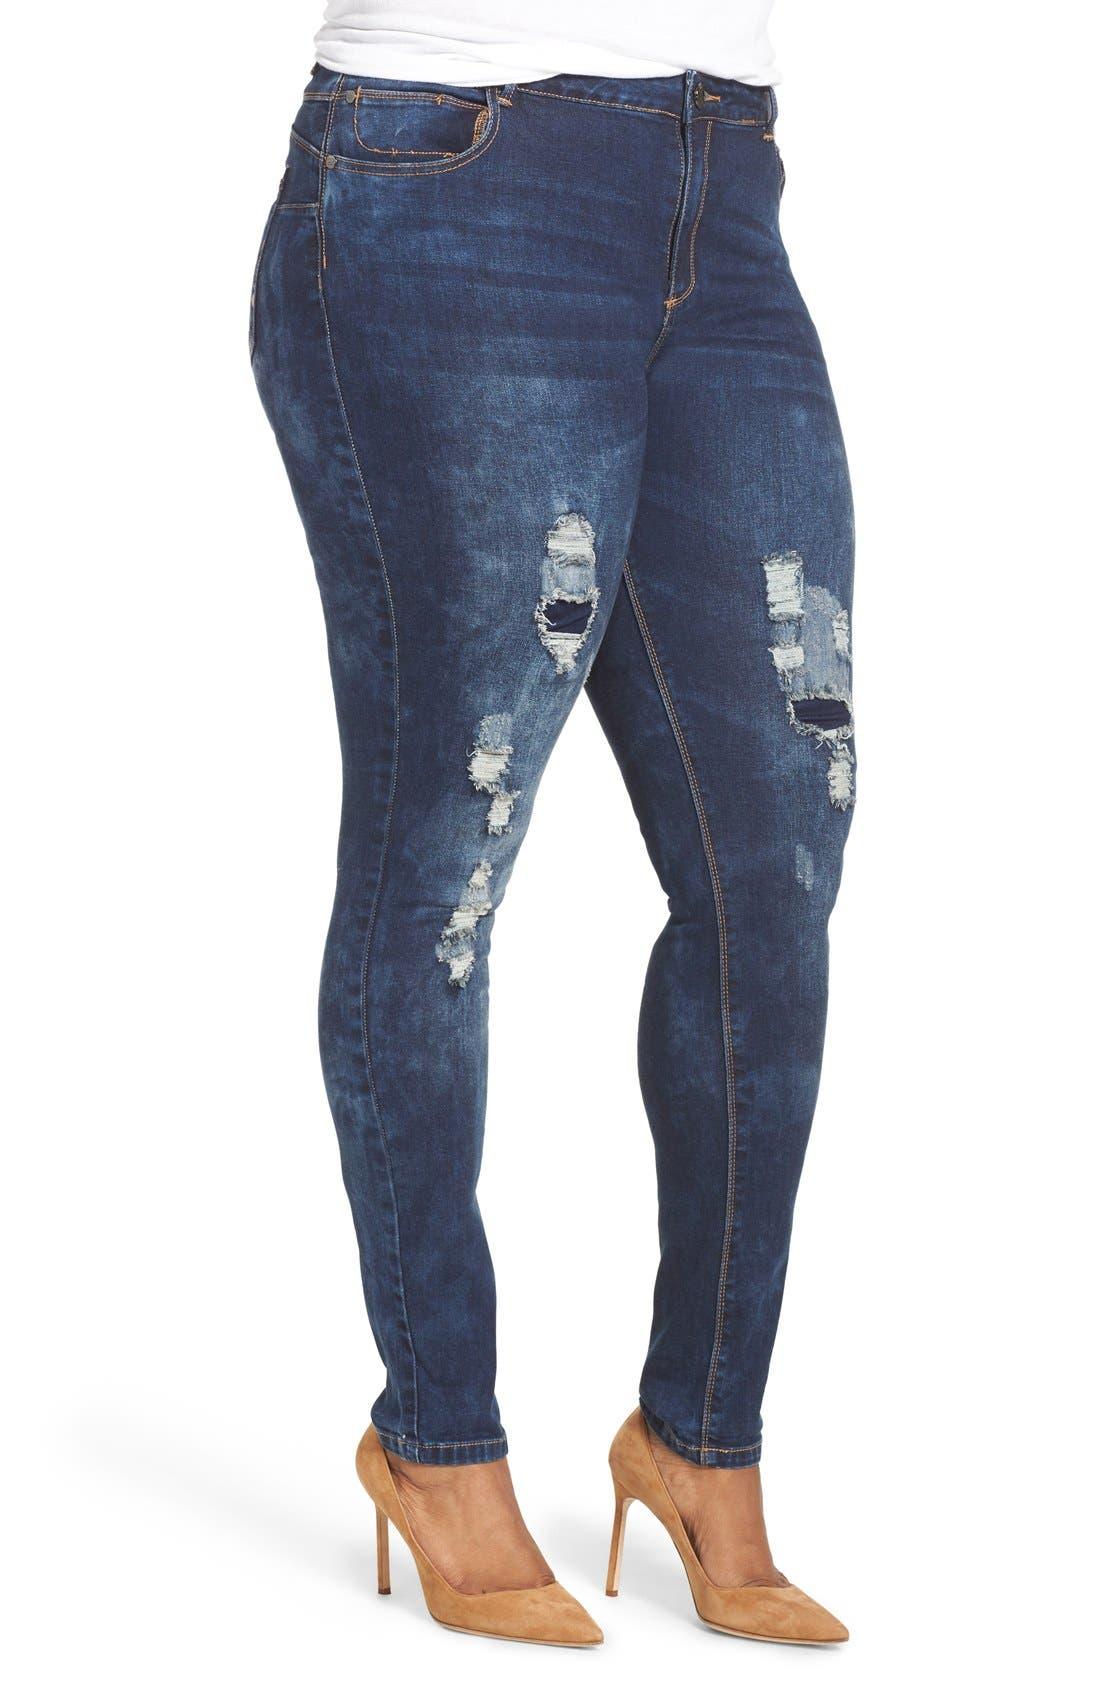 'Dismantle' Ripped Stretch Skinny Jeans,                             Alternate thumbnail 6, color,                             DARK DENIM